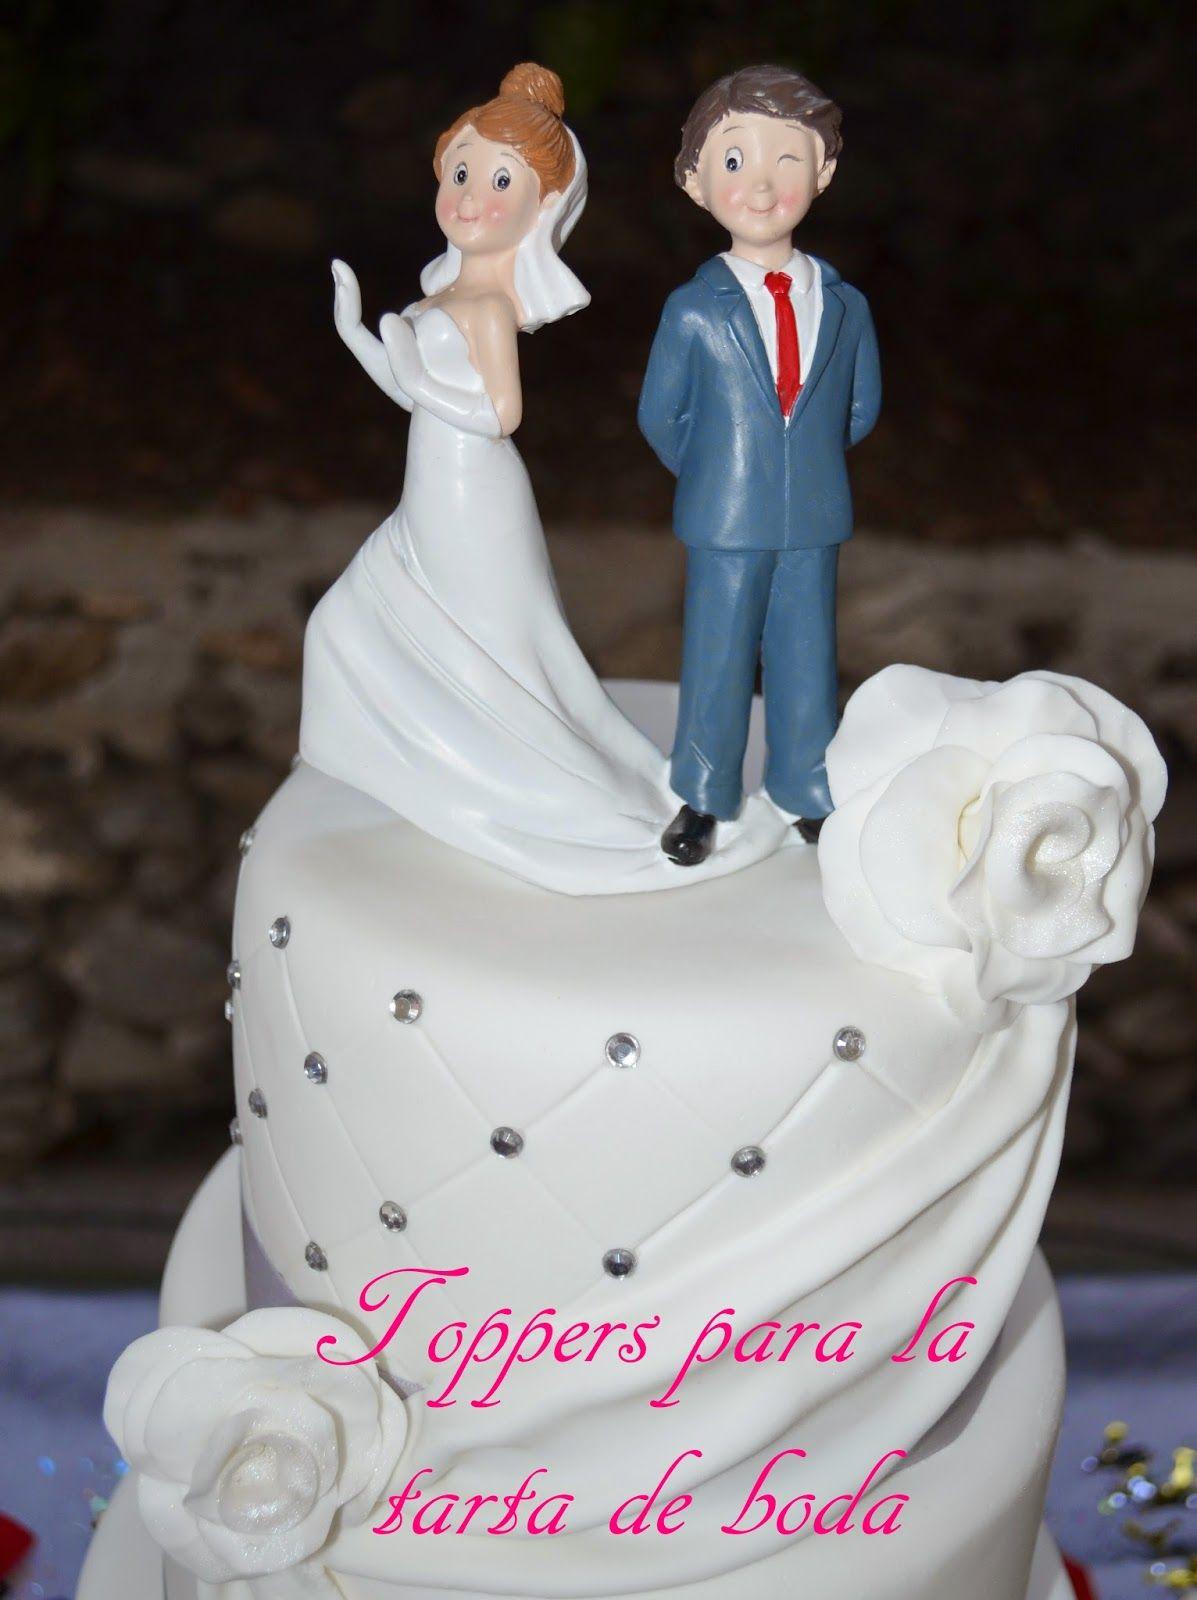 Las bodas de Lorena: Toppers para la tarta de boda